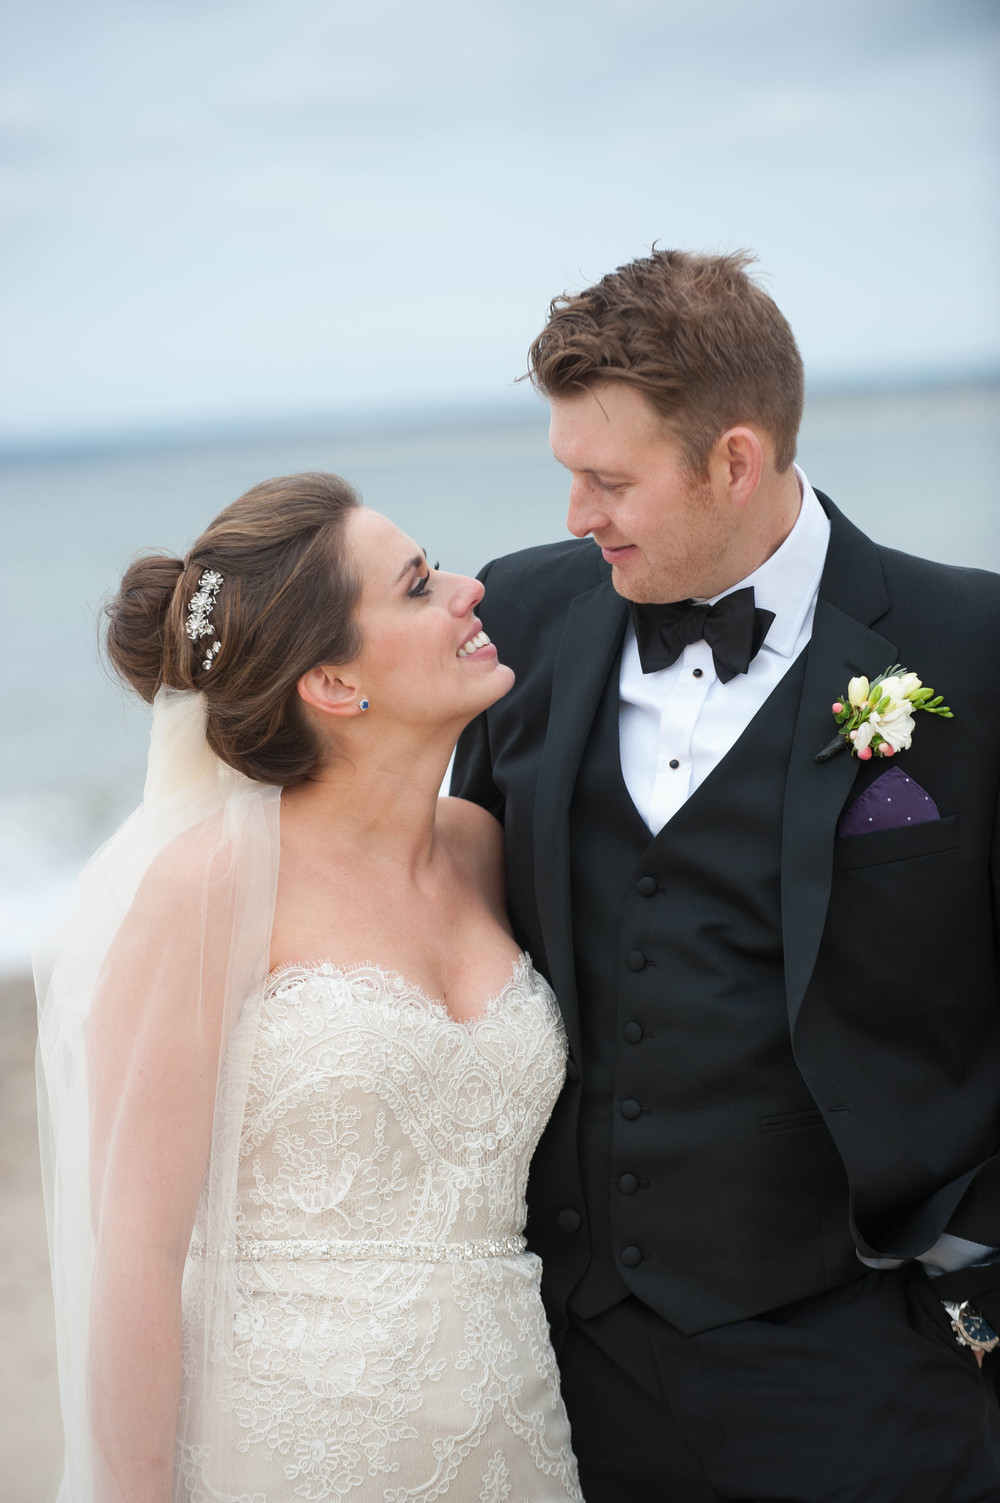 White_Cliffs_Plymouth_Wedding-32.jpg